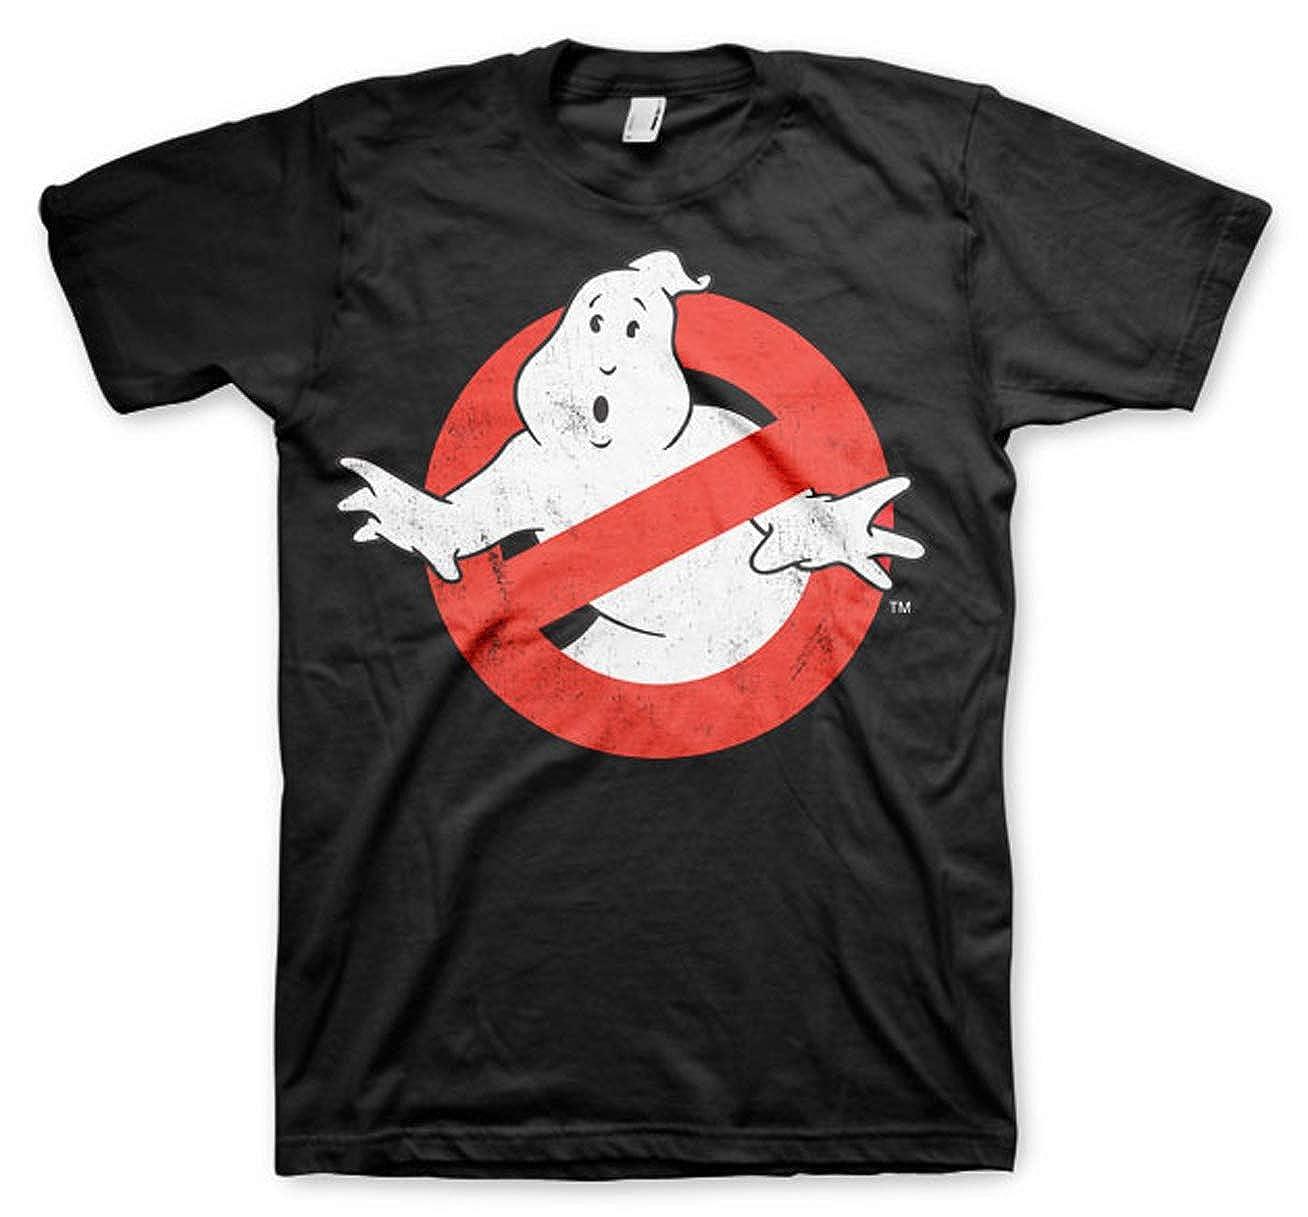 Ghostbusters Logo Bill Murray Dan Aykroyd Tee T-shirt S Unisex